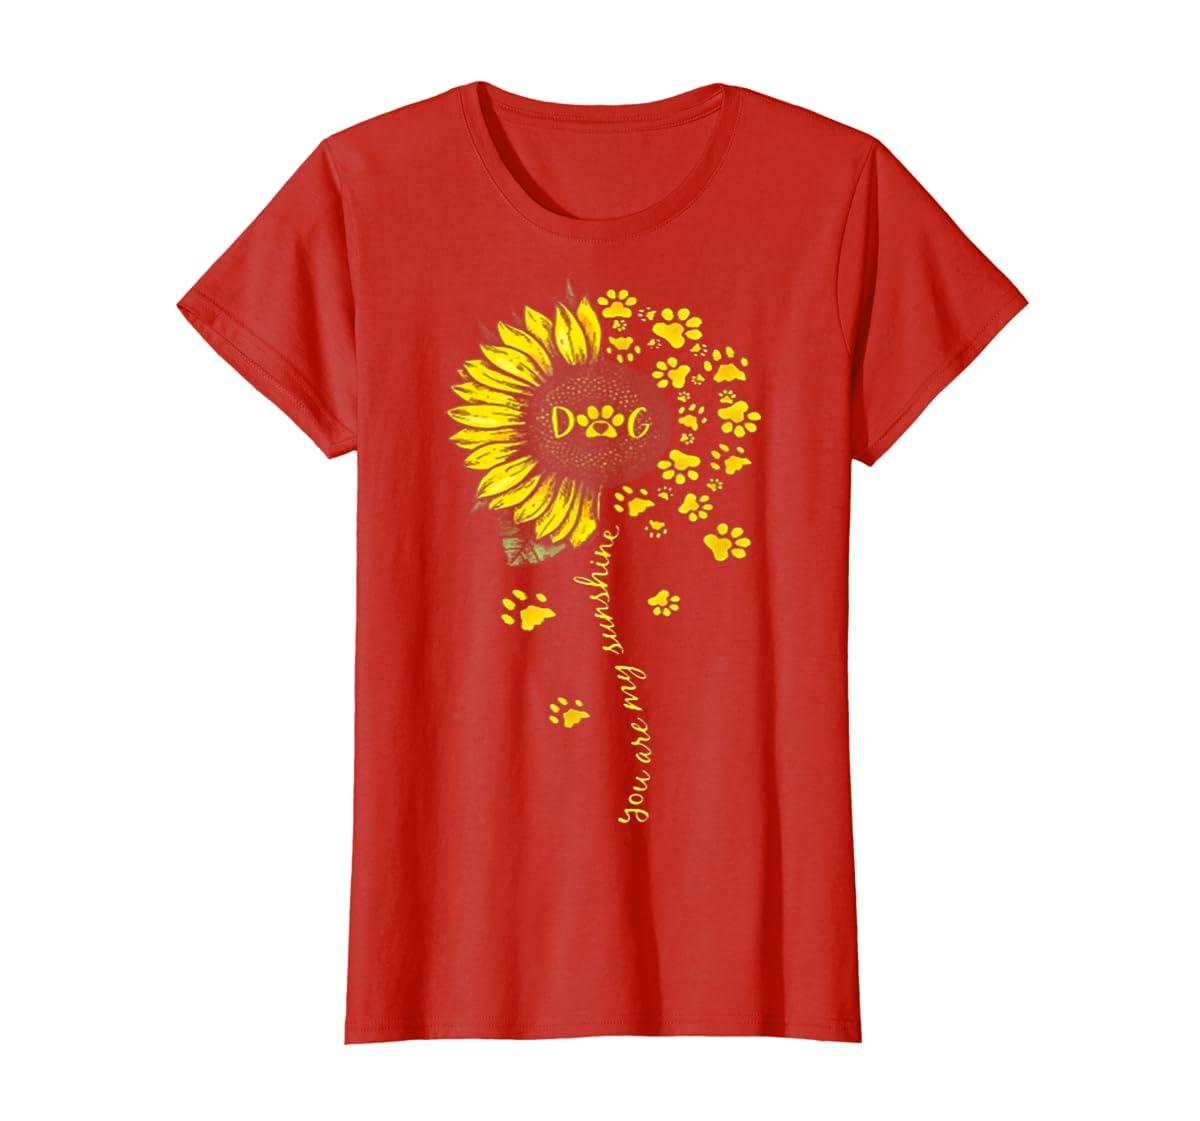 You Are My Sunshine Dog Tshirt-Women's T-Shirt-Red